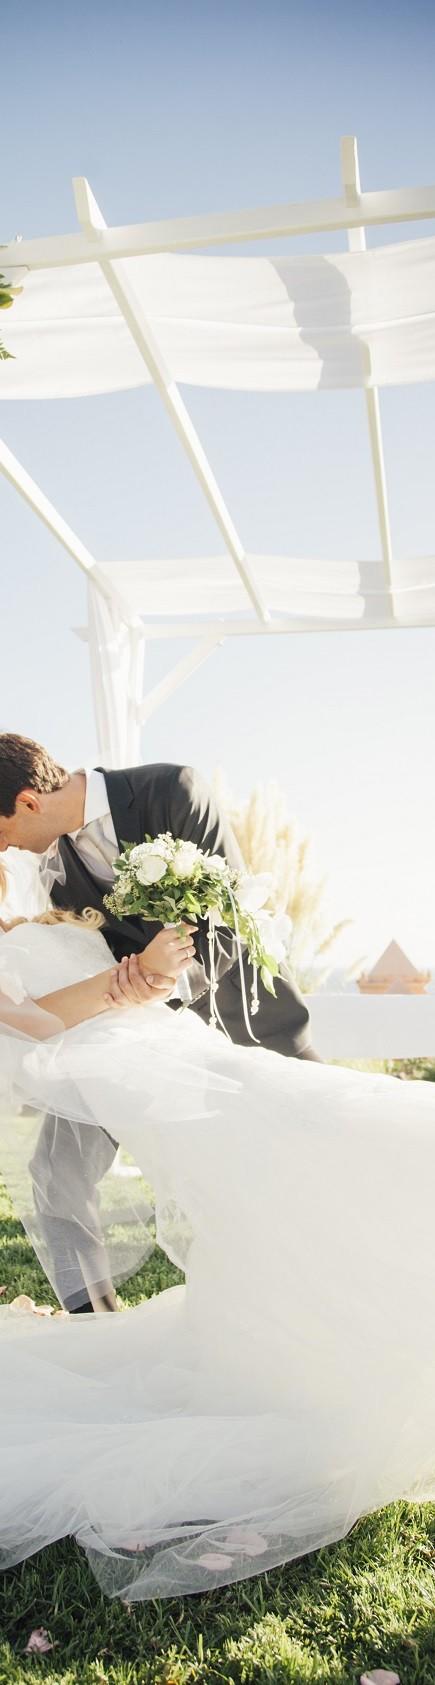 Wedding-Ewa-and-Marek-in-tenerife-myperfectwedding0955